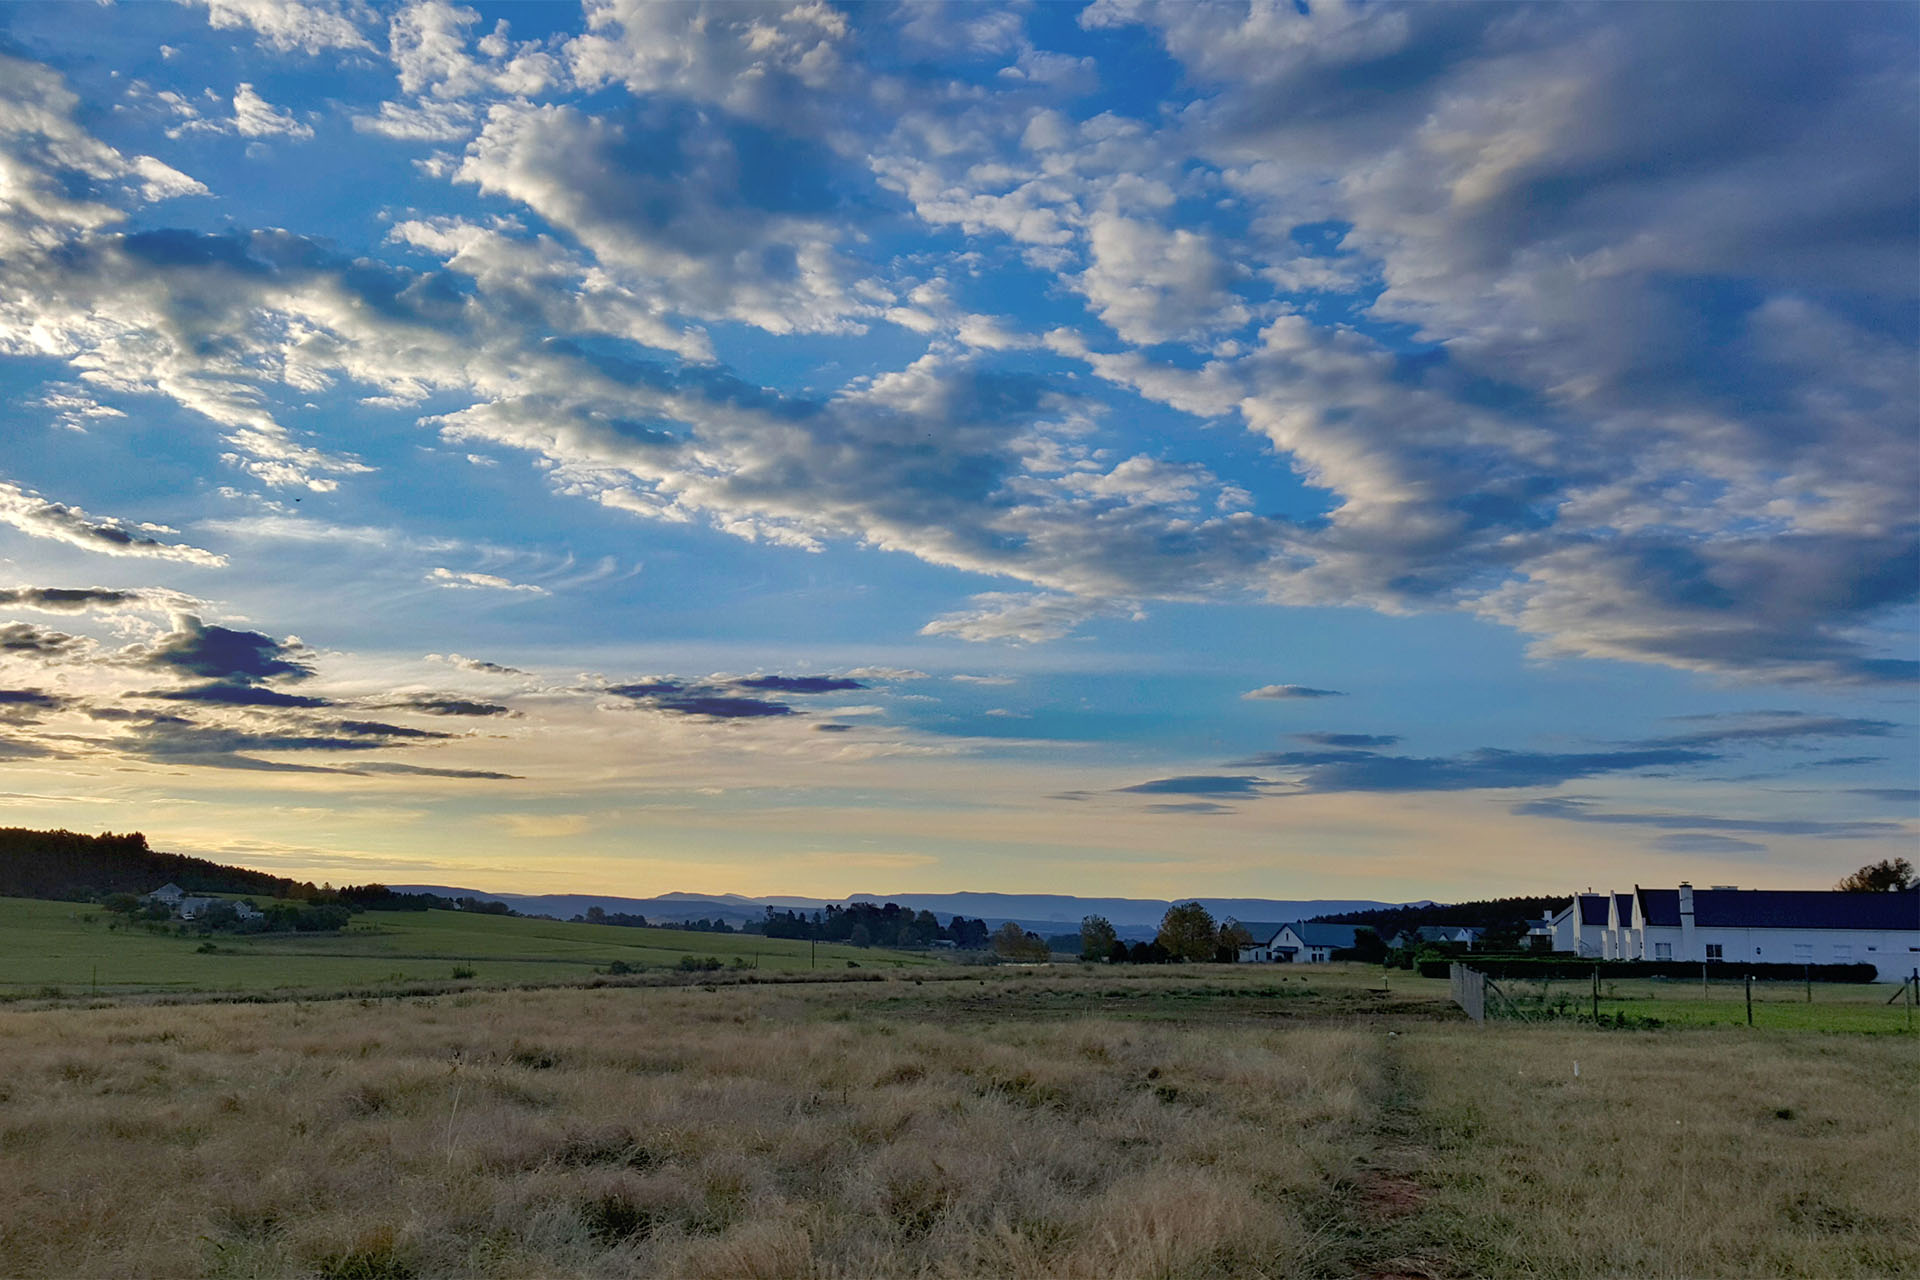 amenities-rockjumper-birding-birds-garlington-estate-luxury-country-development-hilton-kzn-midlands-contemporary-countryside-farm